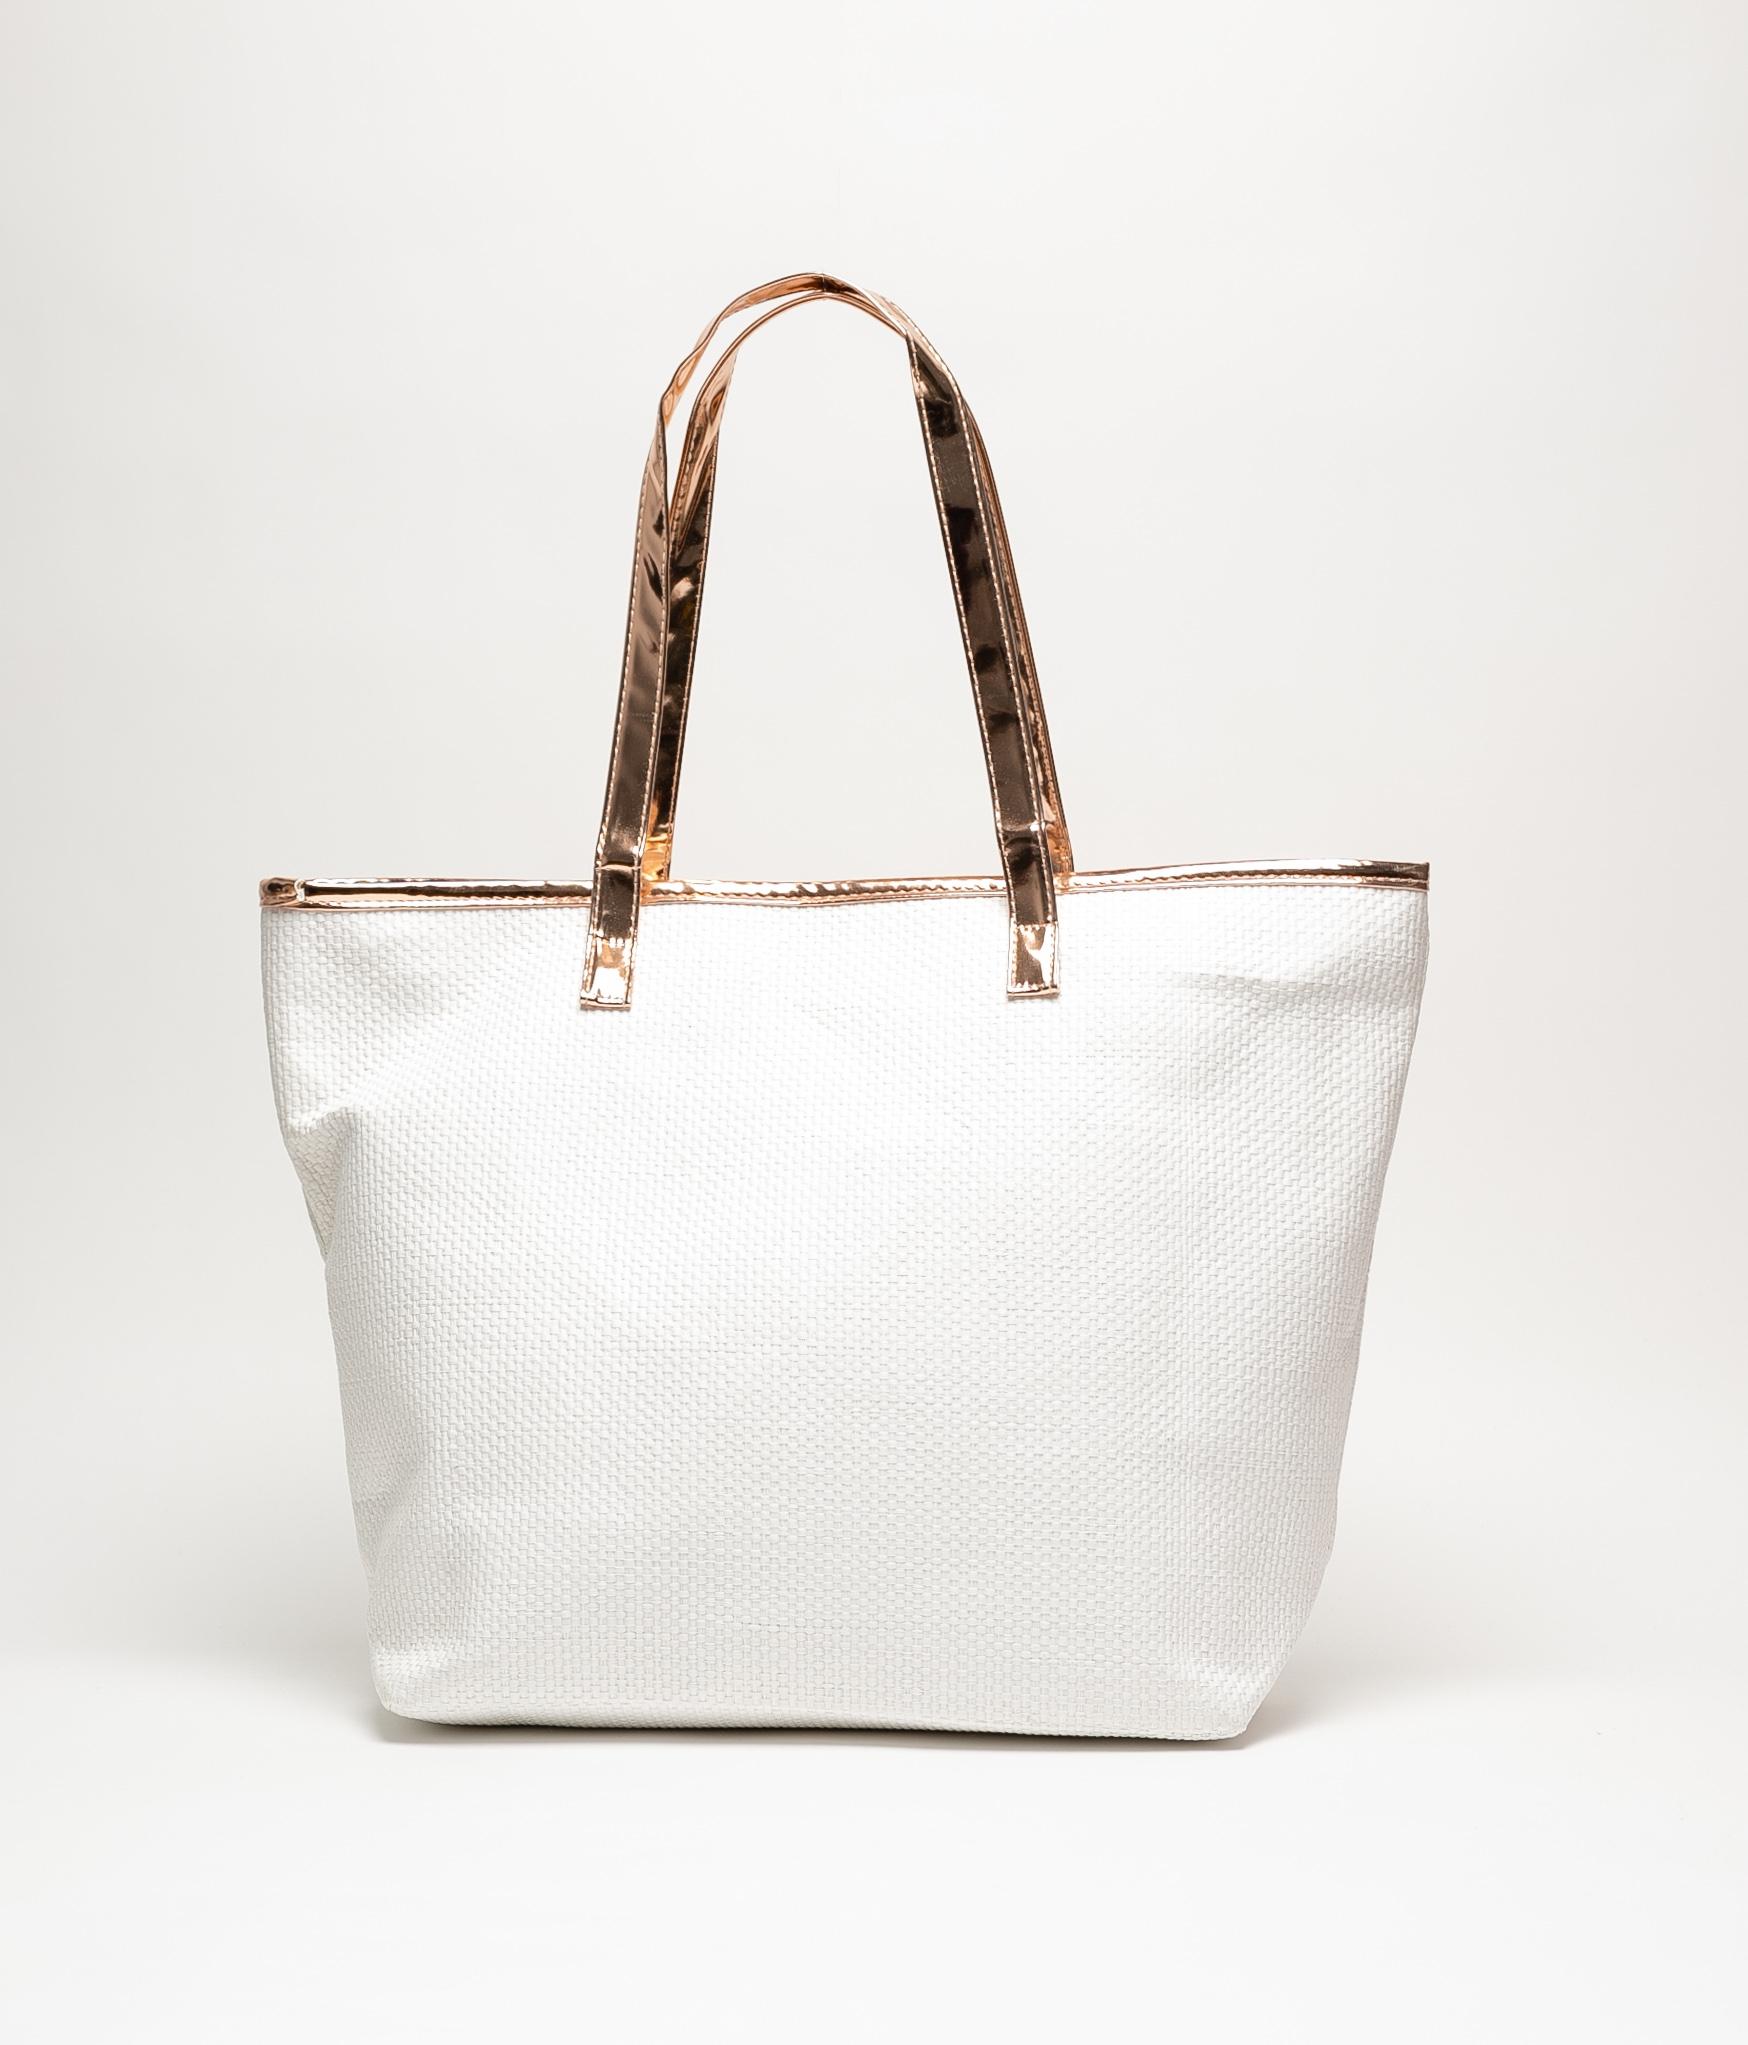 HELLO BEACH BAG - WHITE CHAMPAGNE